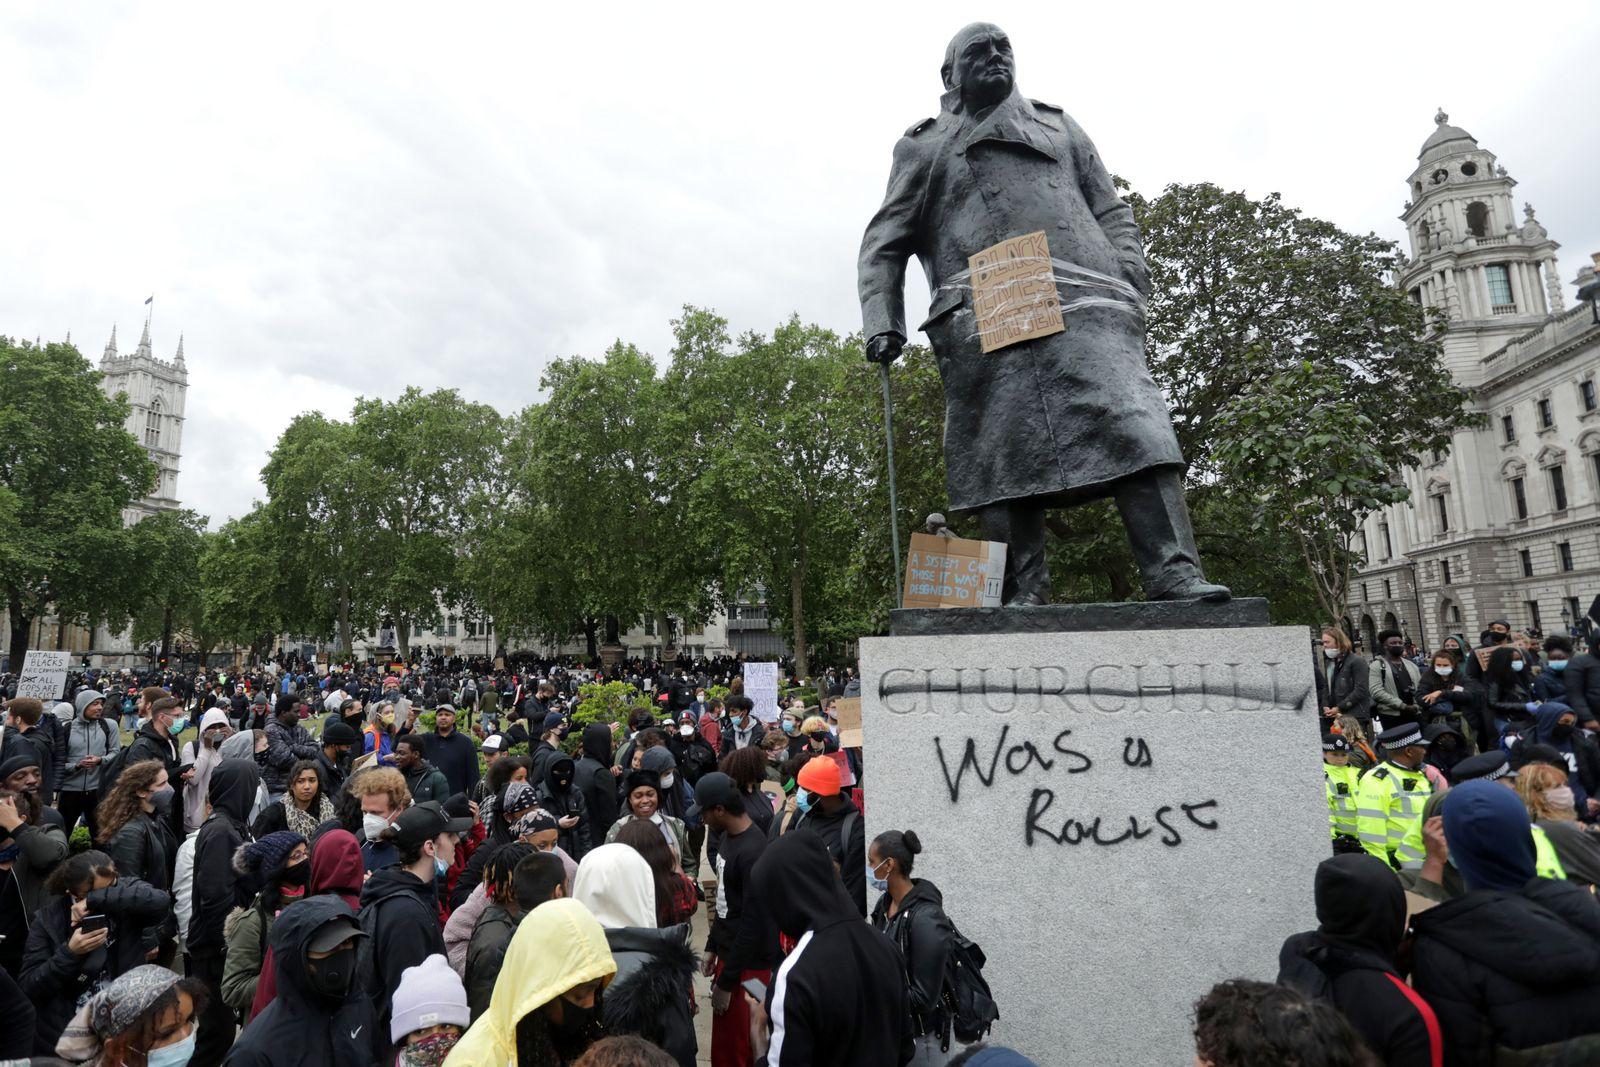 AFP-ประท้วงต่อต้านเหยียดผิว ทำลายรูปปั้นอดีตผู้ค้าทาส นักล่าอาณานิคมทั่วโลก วินสตัน เชอร์ชิล Black Lives Matter